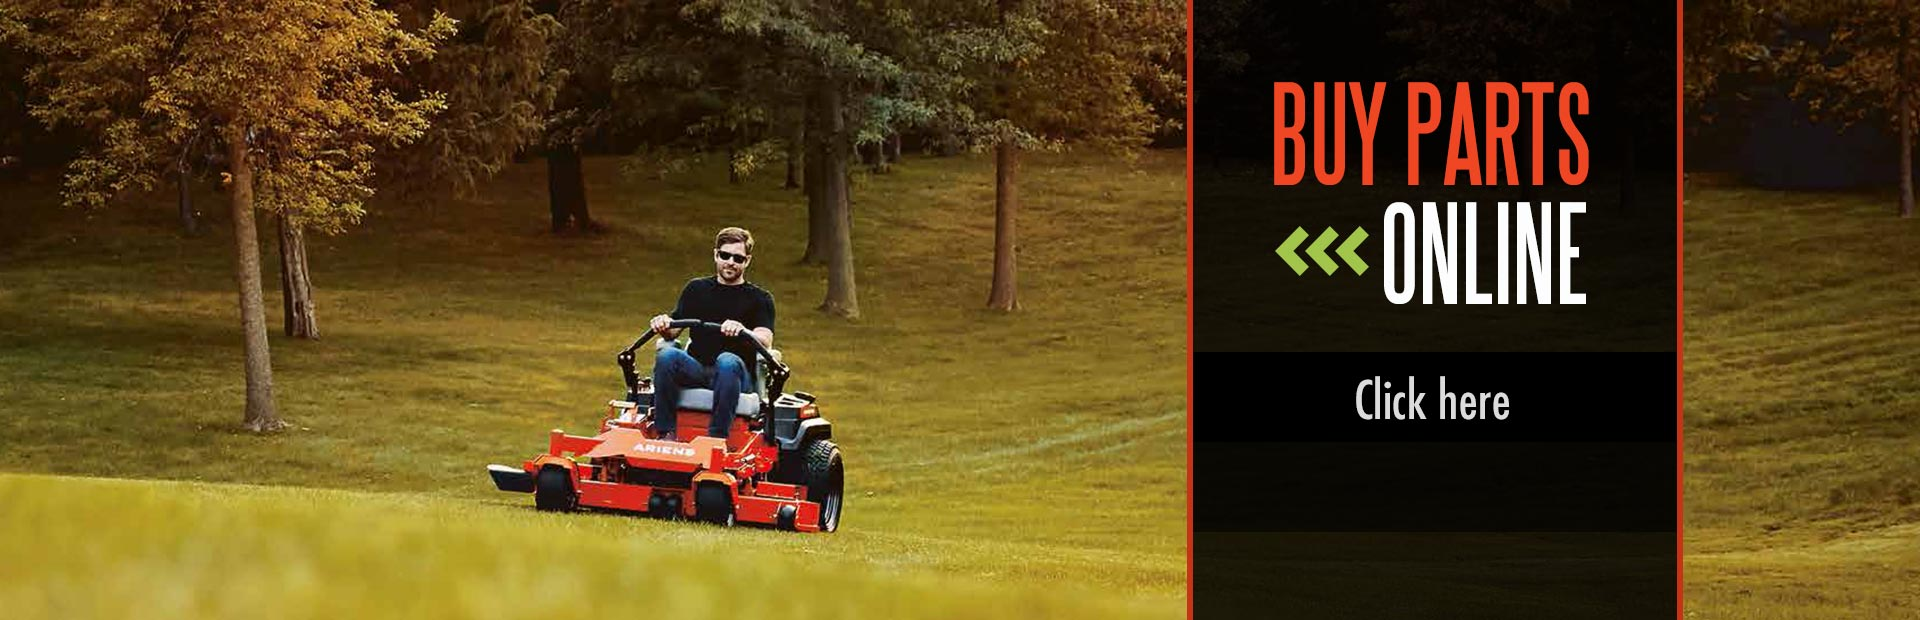 Home Stoller Lawn & Garden, Inc. Orrville, OH (330) 682-7436